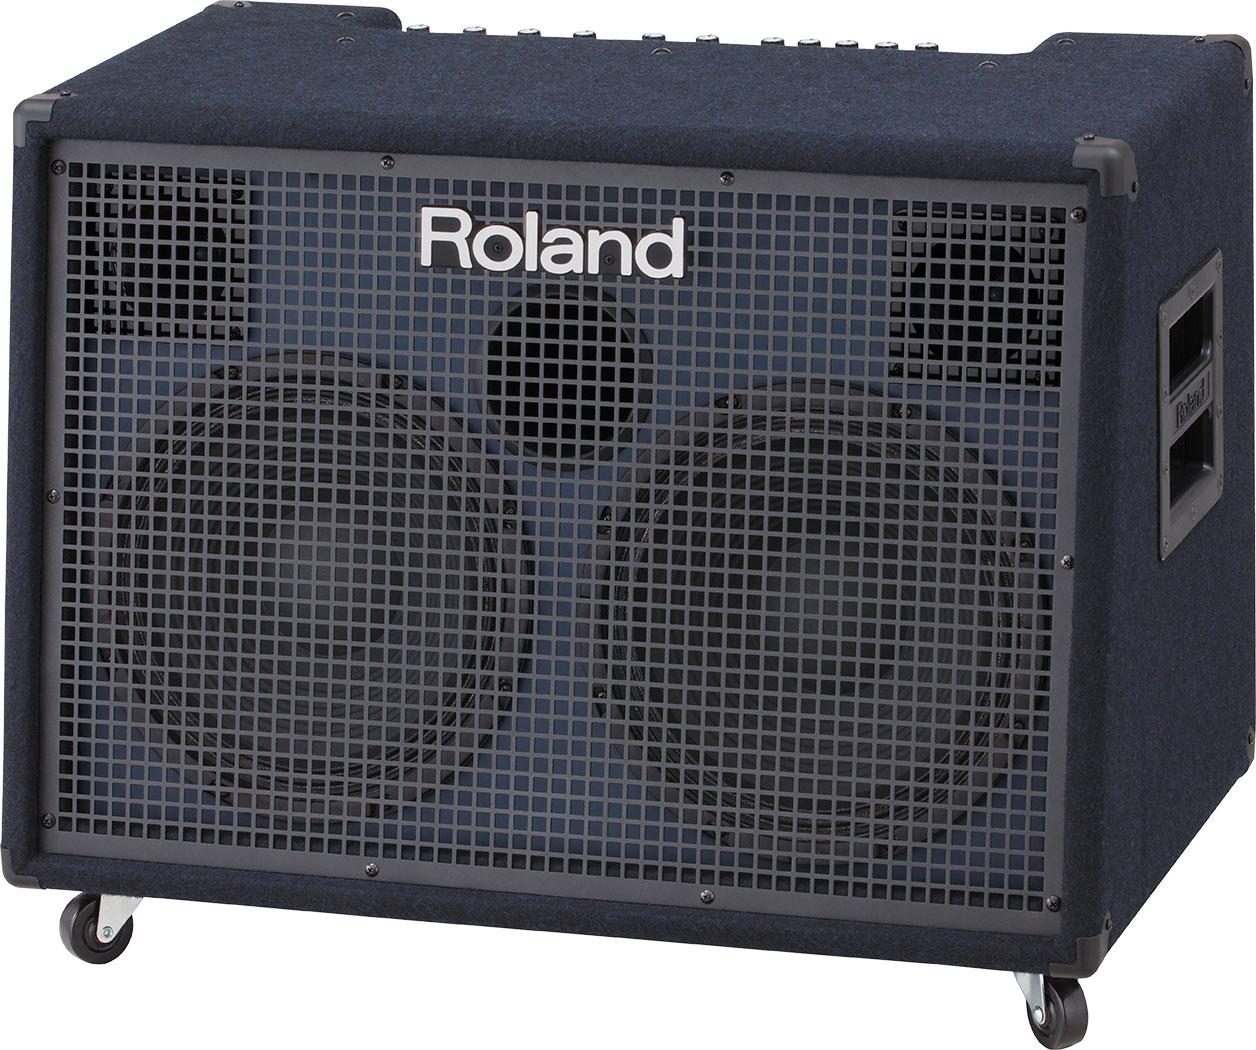 Roland KC990